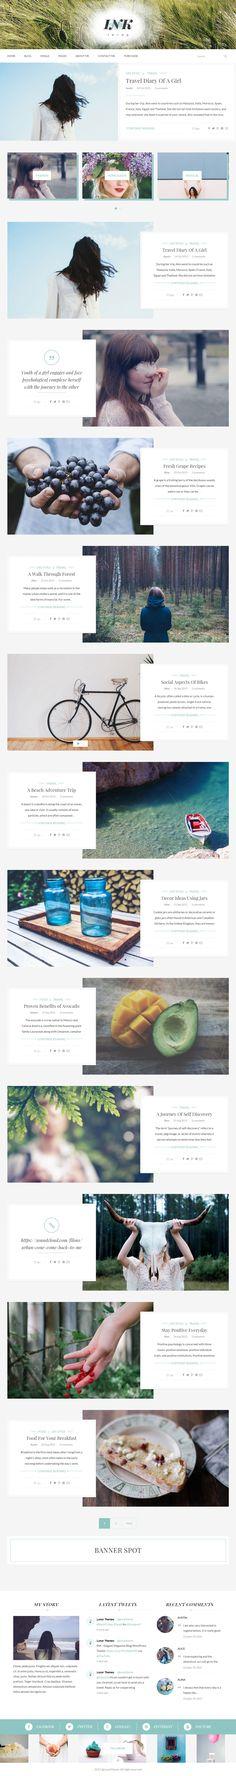 Blog Design Inspiration, Fashion Themes, Google Fonts, Website Themes, Social Media Icons, Website Template, Wordpress Theme, Web Design, Theme Ideas